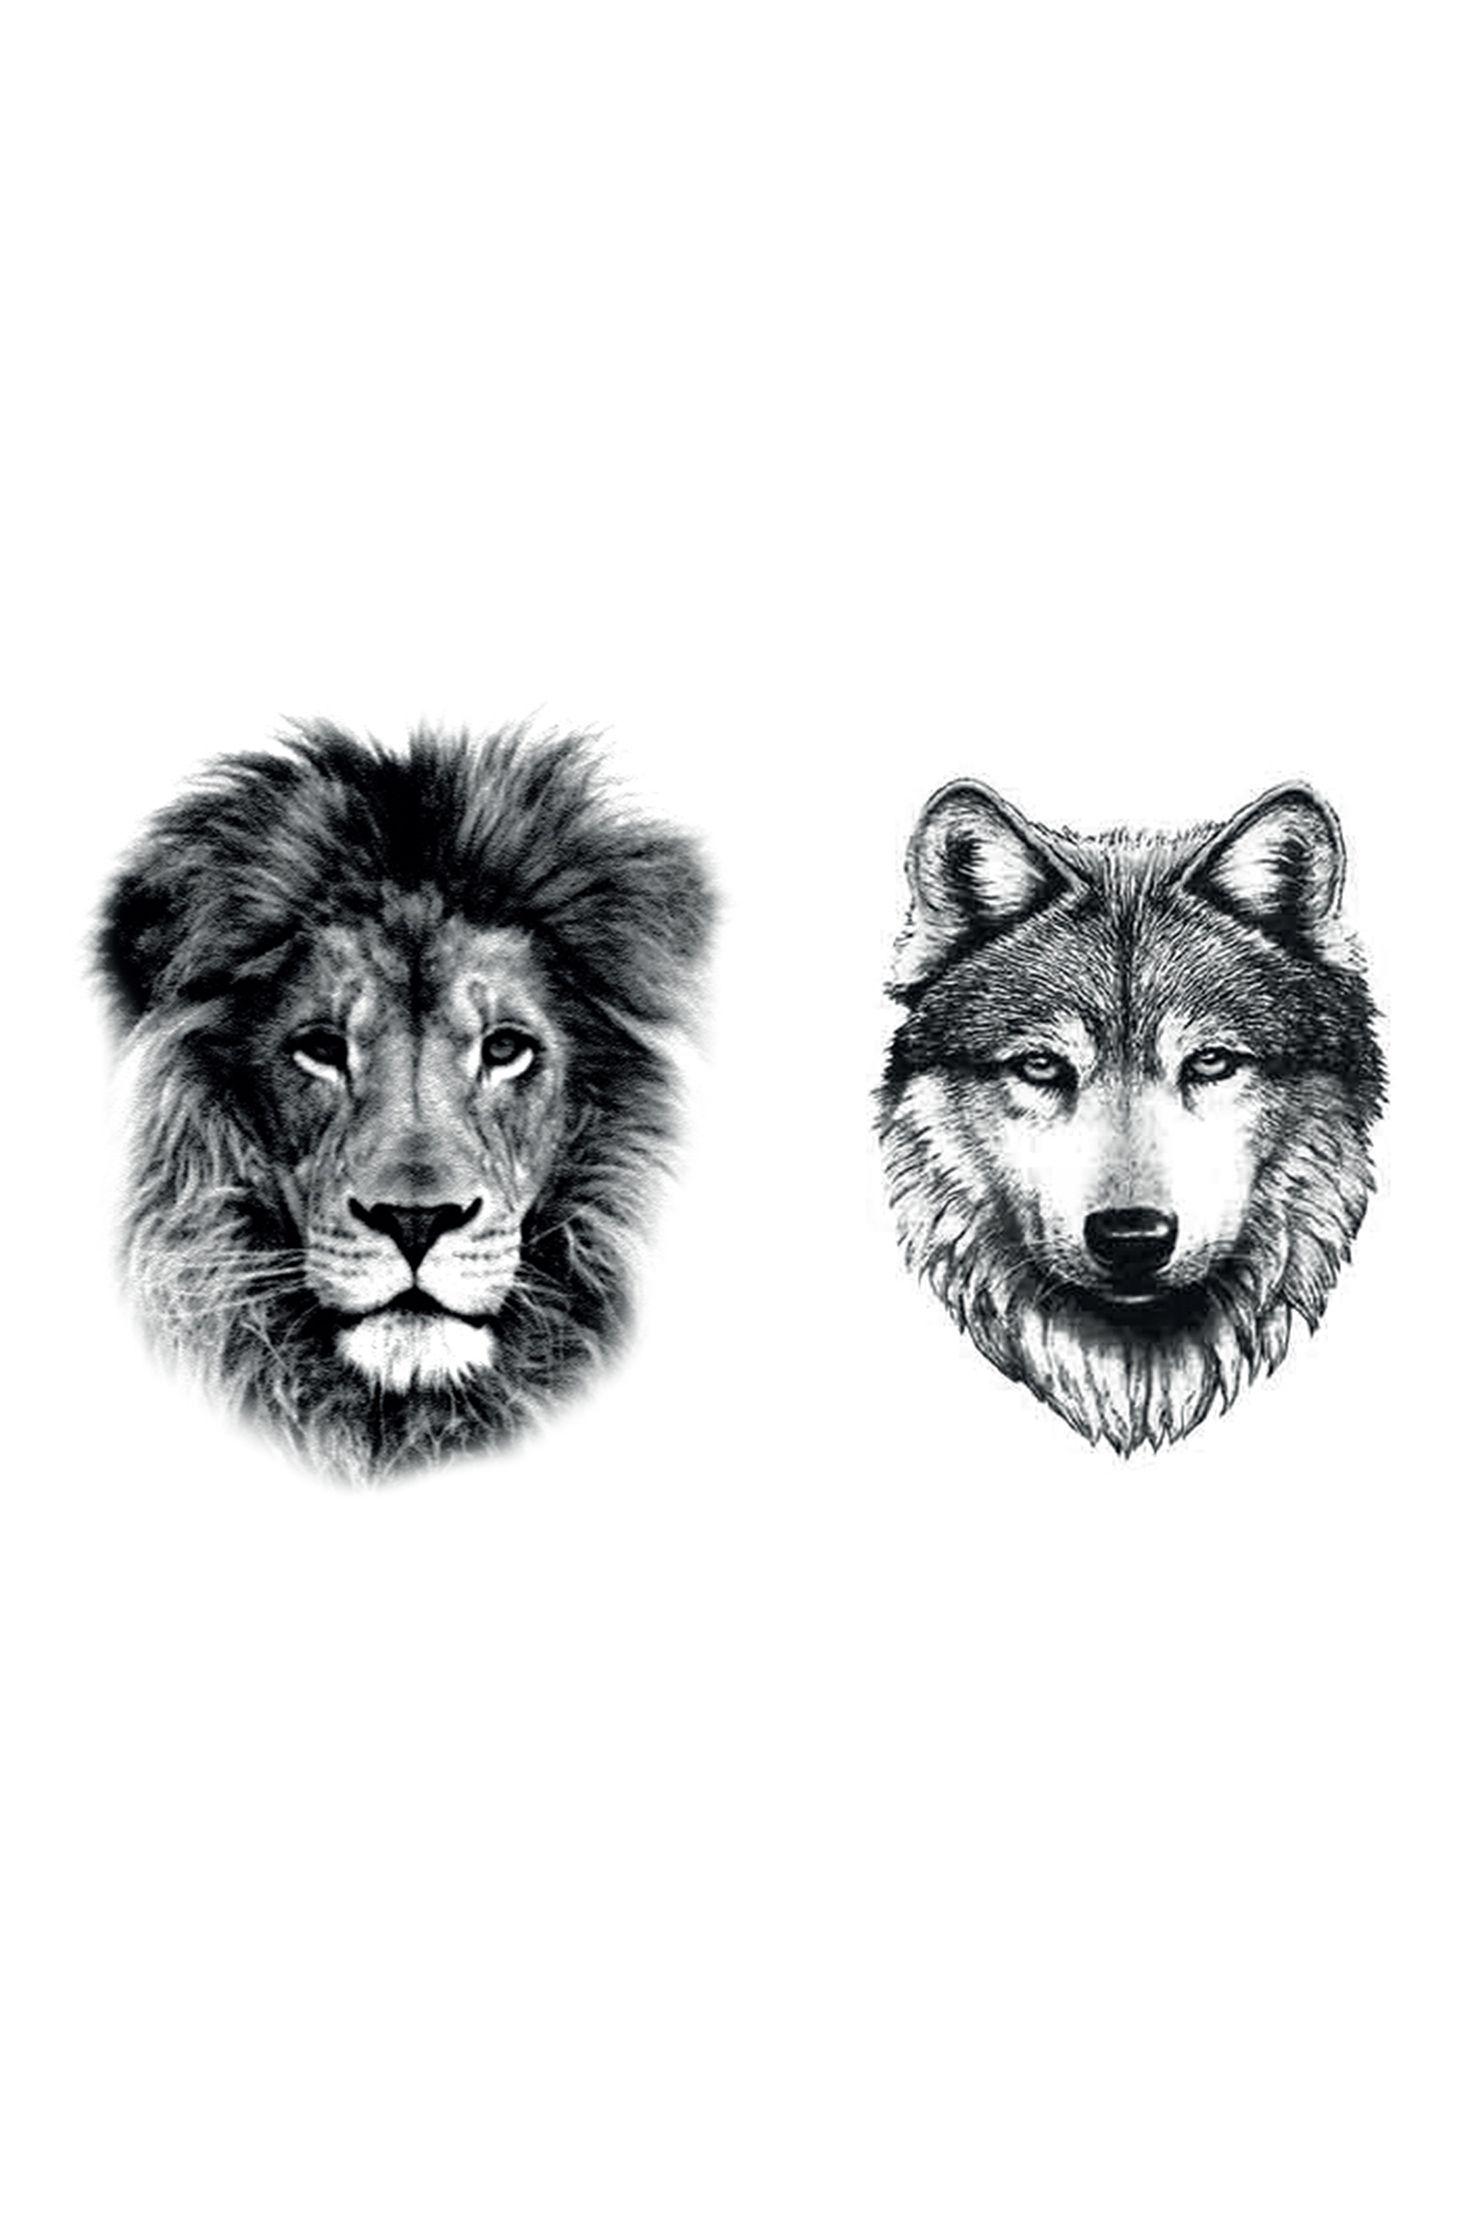 Afficher L Image D Origine Un Tatoo Tatouage Tattoo Lionne